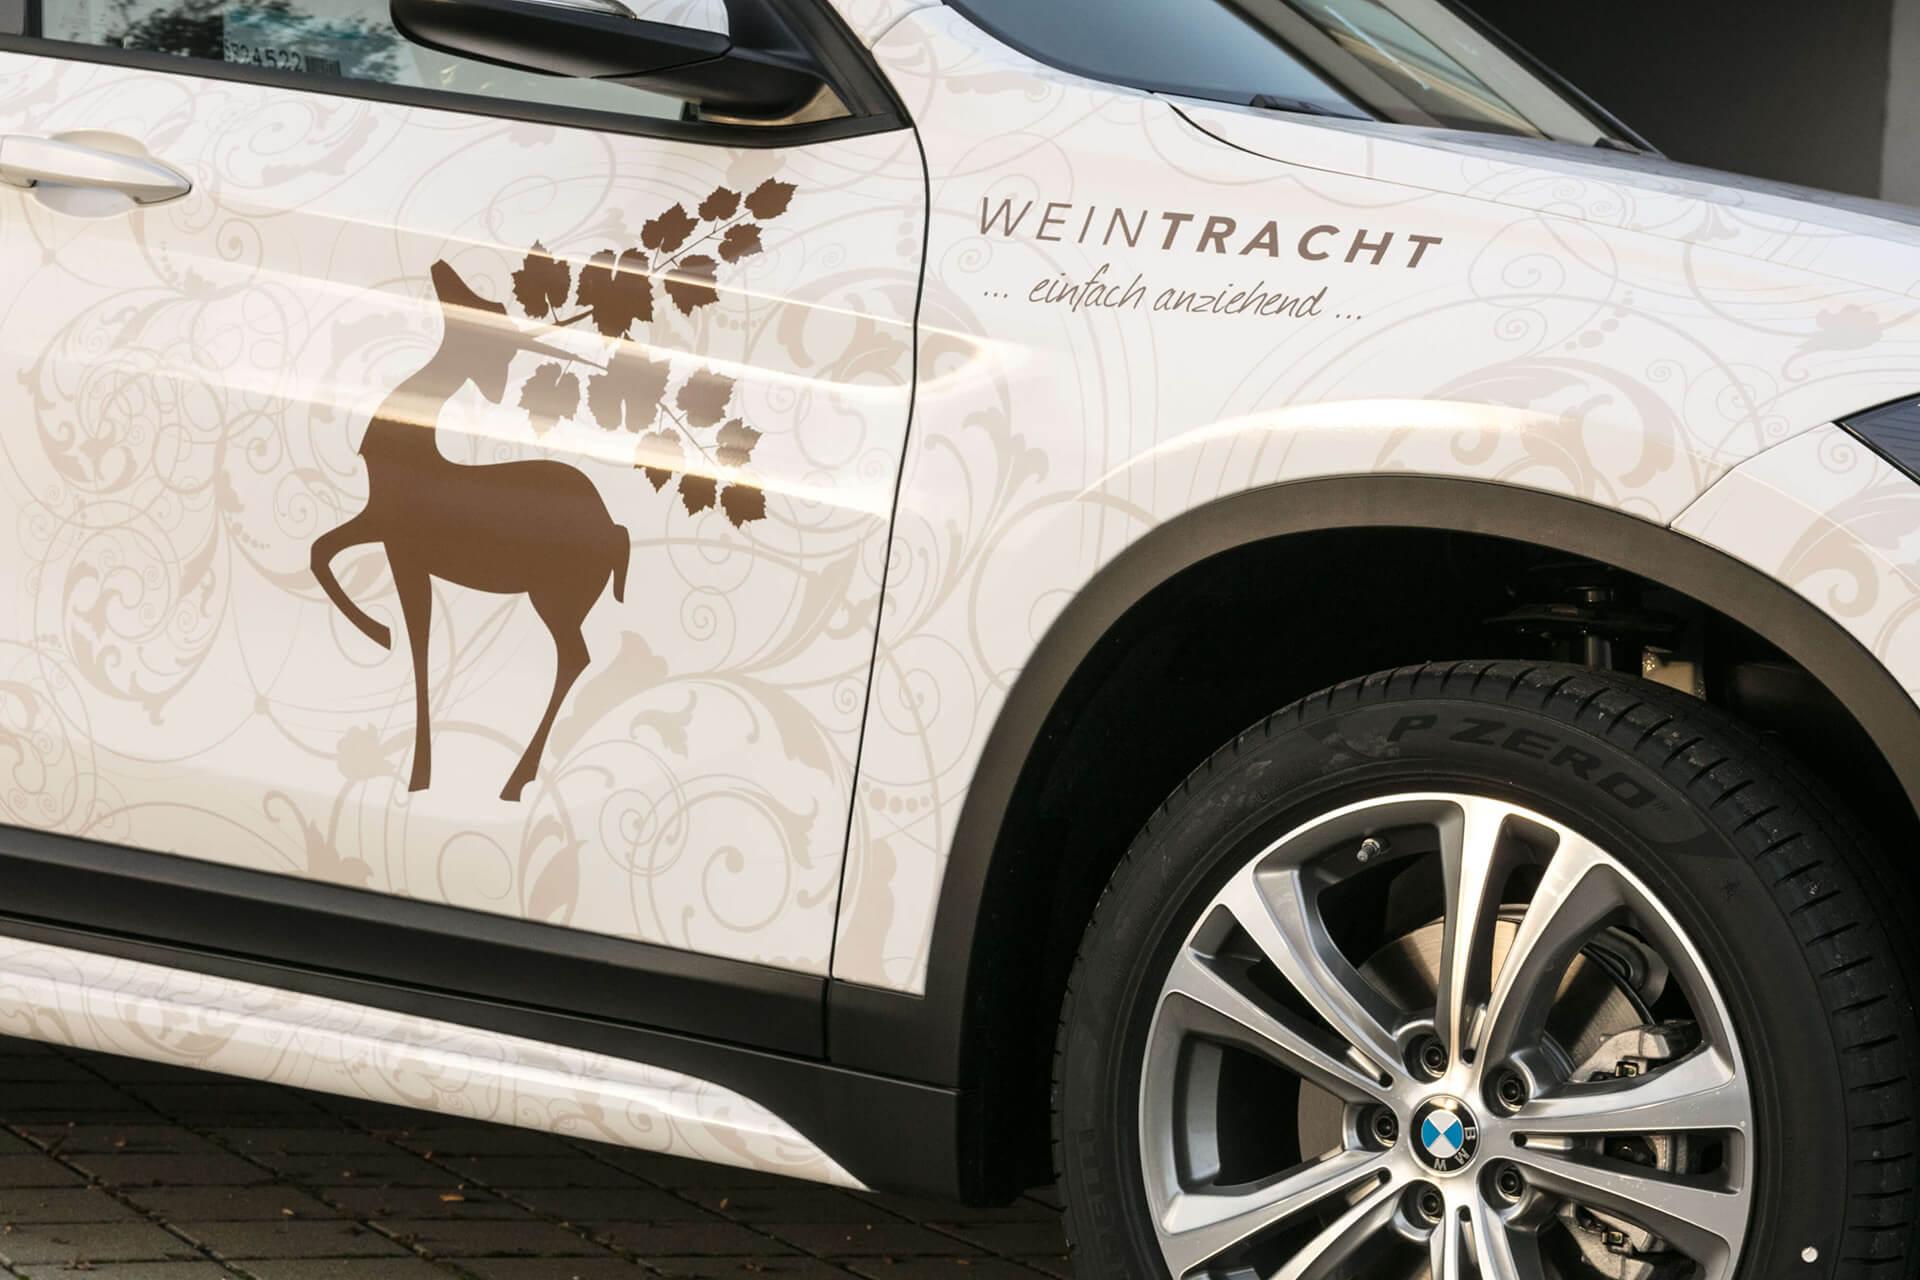 Weintracht Car Styling Detailfoto des Logos